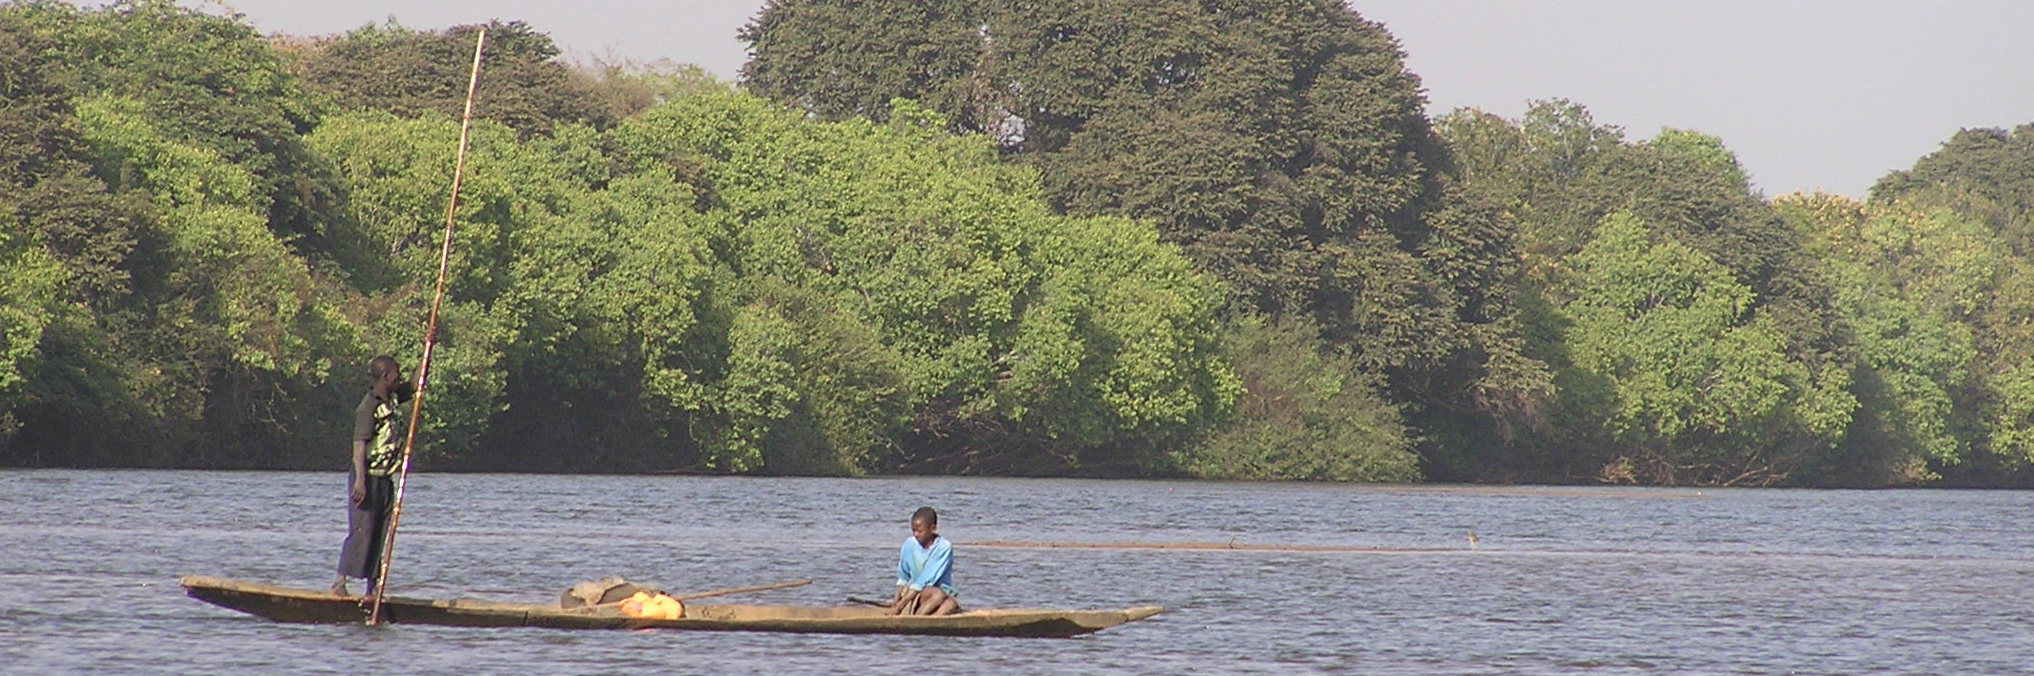 Foto Baro Boot auf dem Fluss